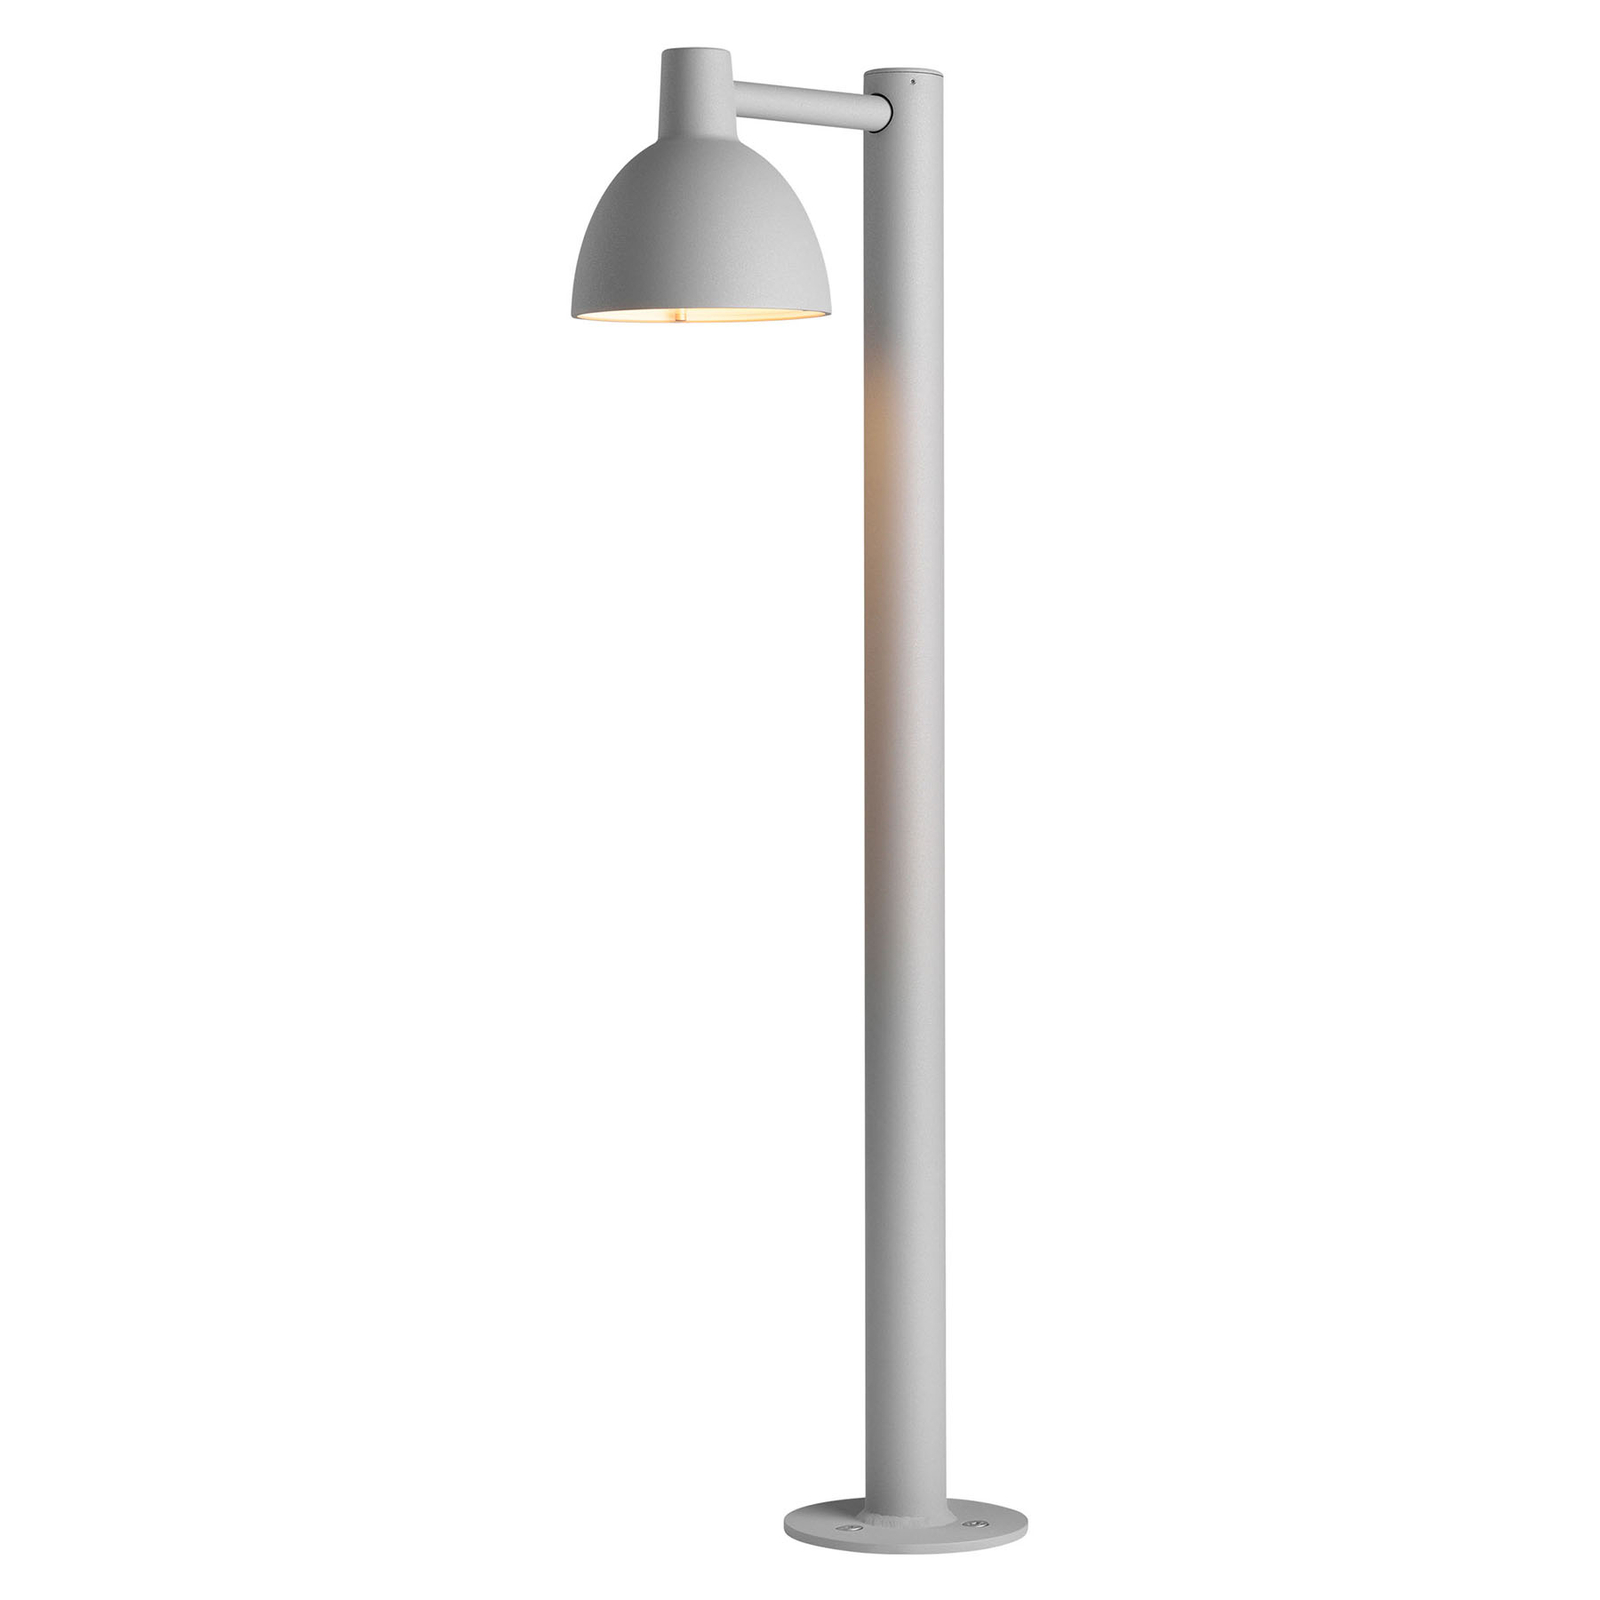 Louis Poulsen Toldbod gånglampa, aluminium